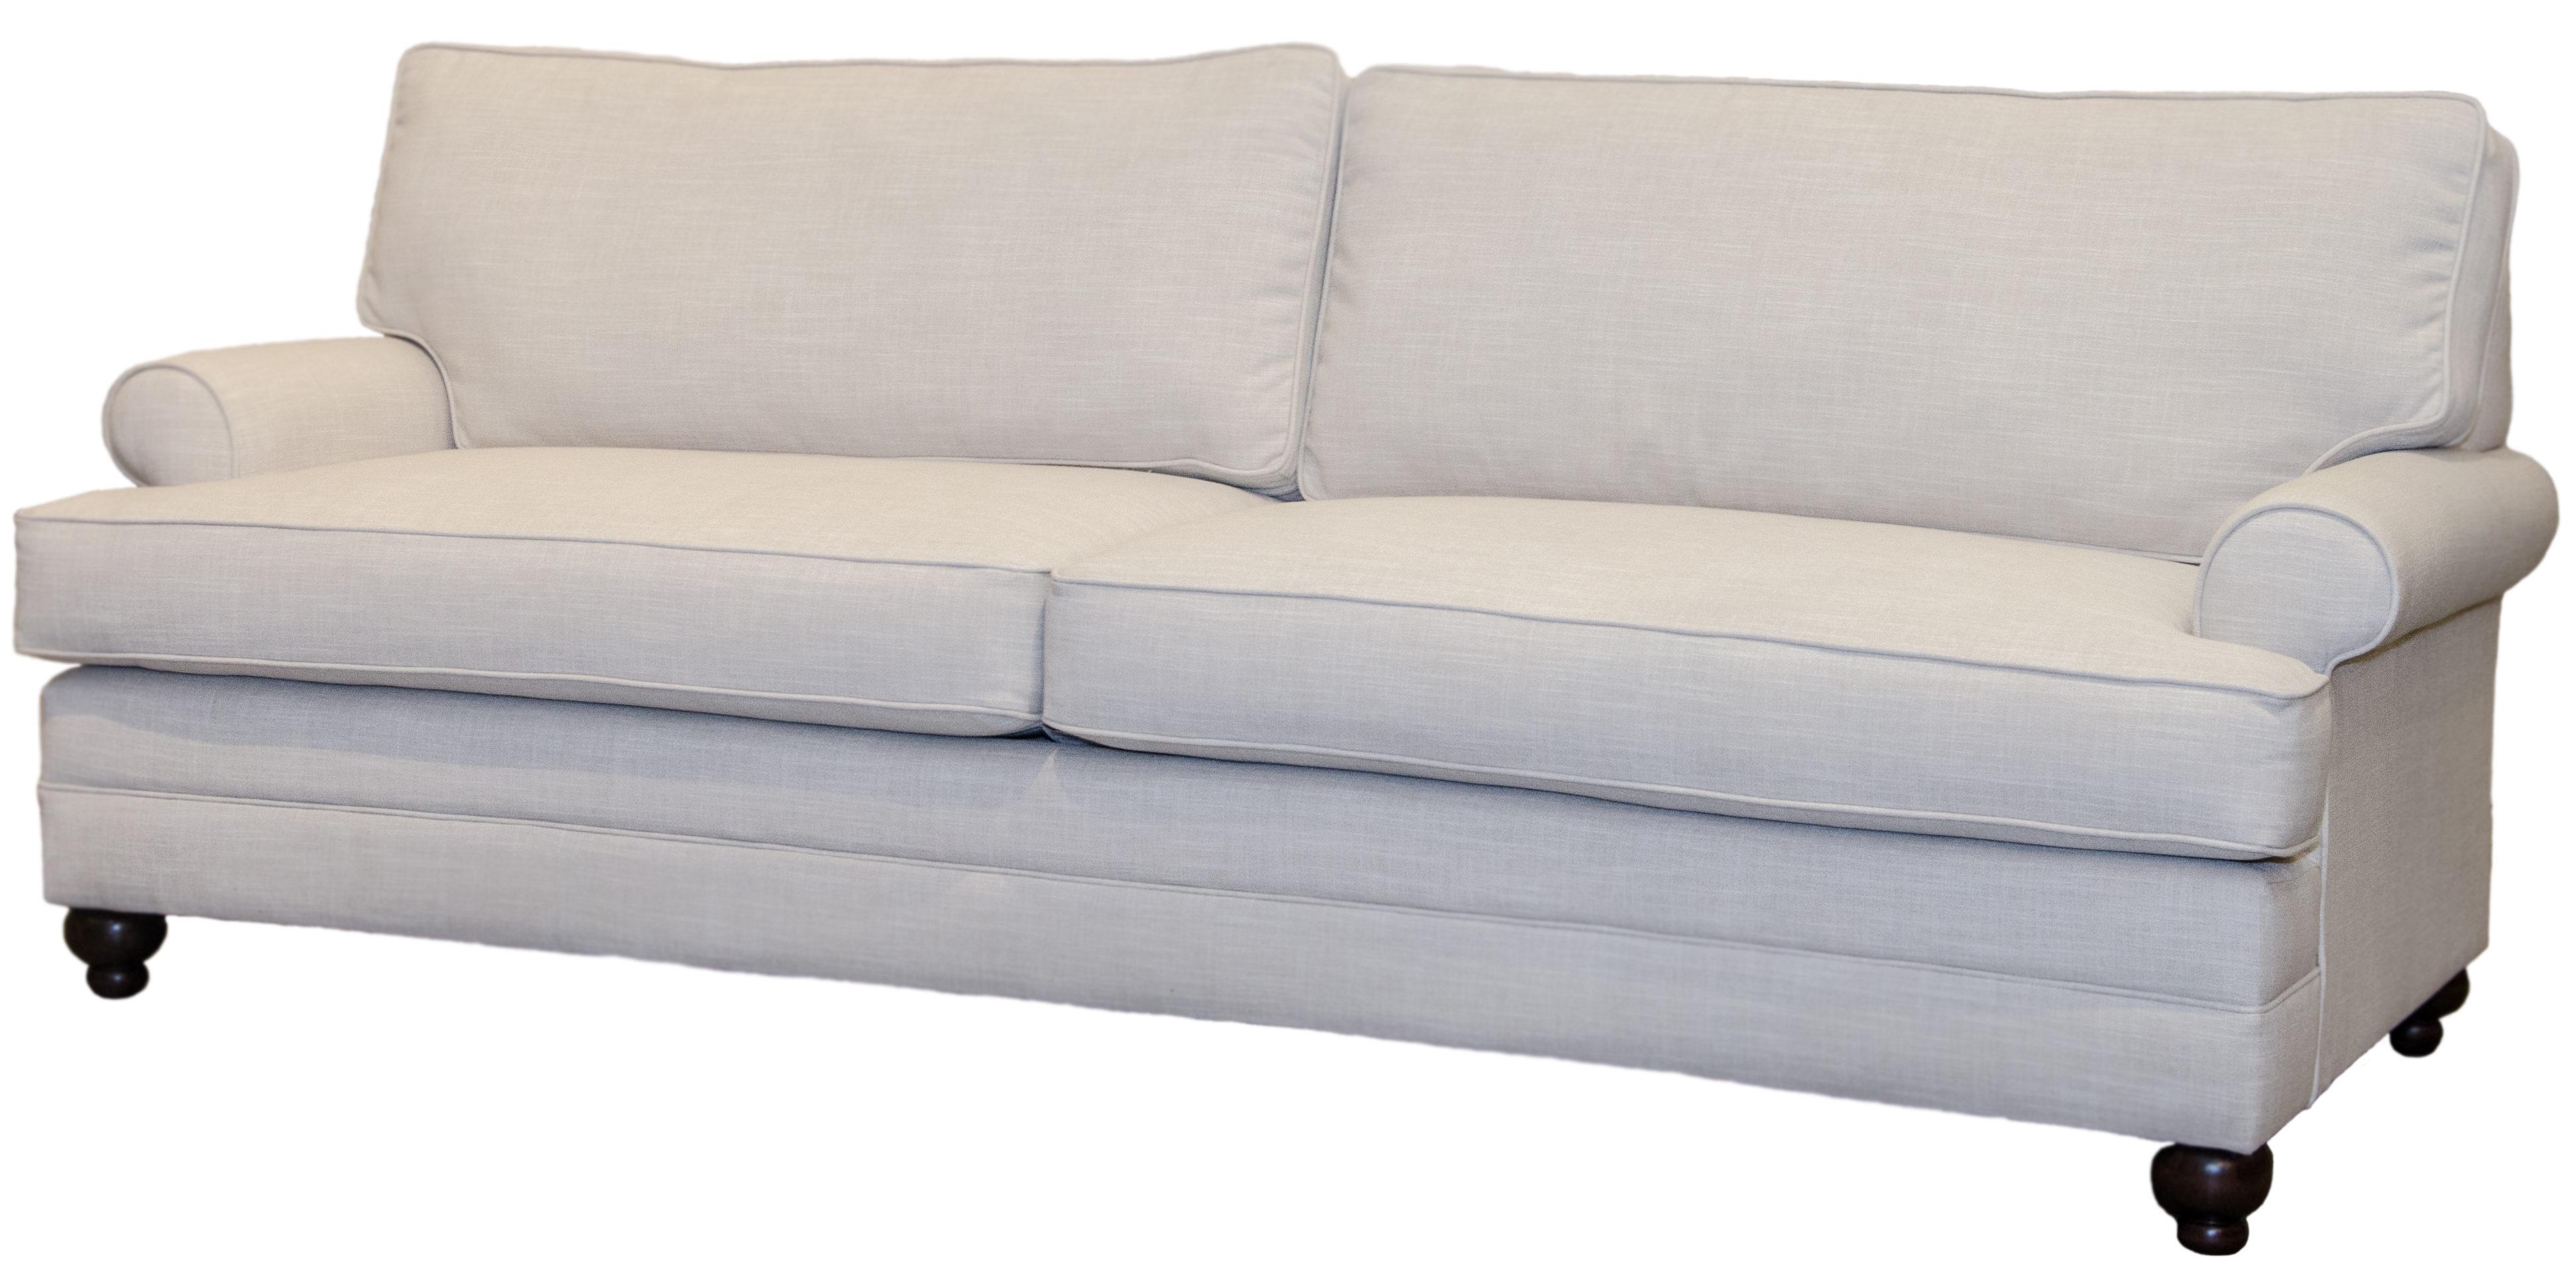 nicole t sofa santa barbara design center